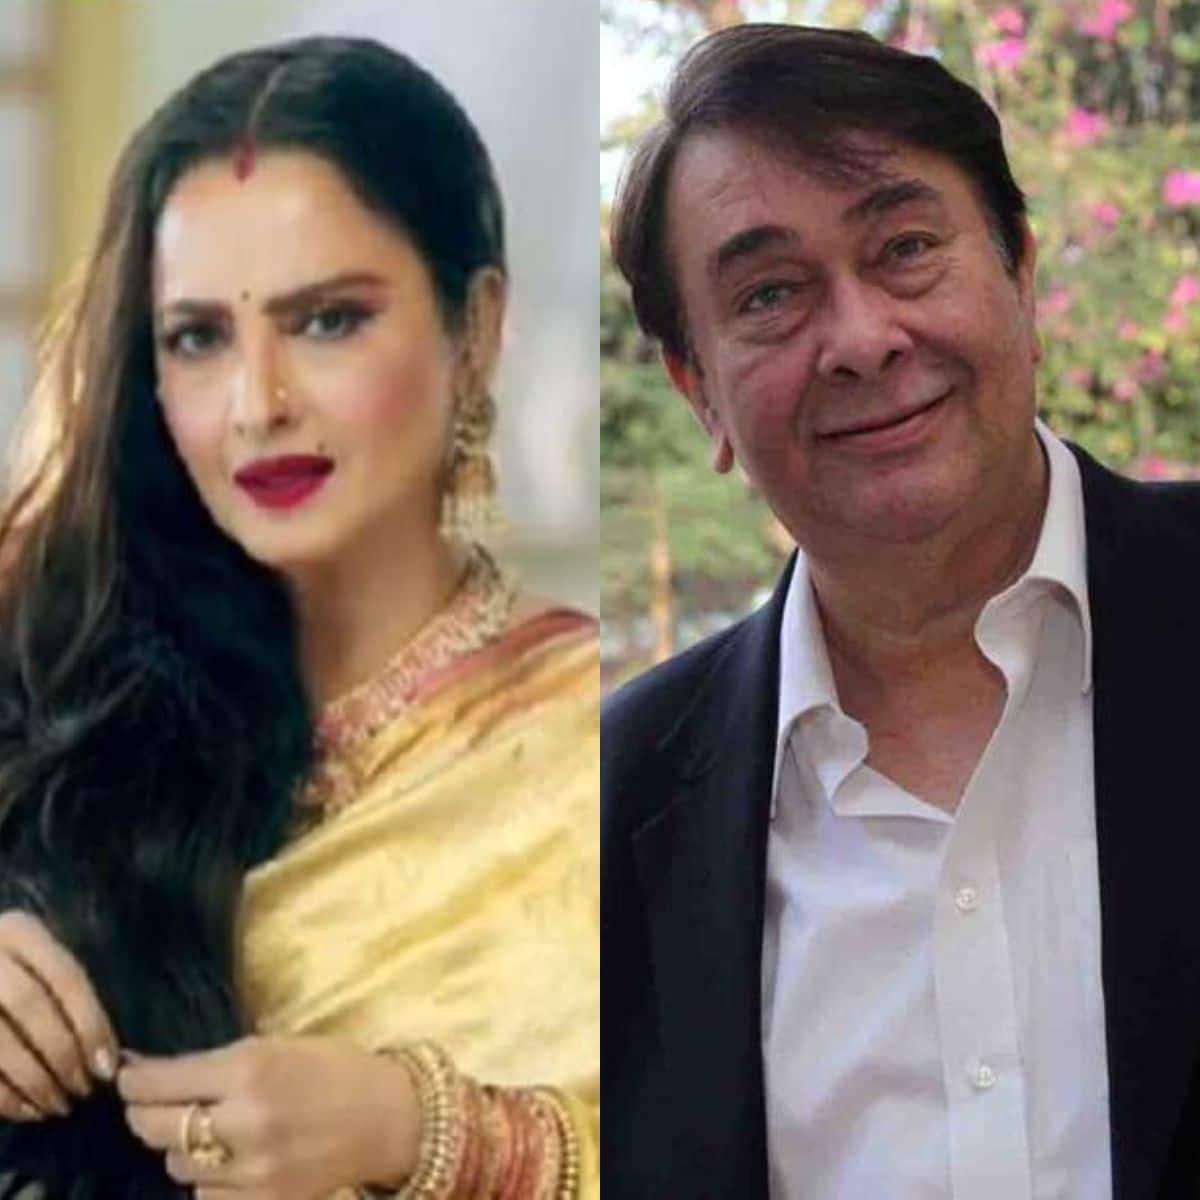 Ghum Hai Kisikey Pyaar Meiin: After Rekha, Randhir Kapoor to be a part of  Neil Bhatt, Ayesha Singh and Aishwarya Sharma starrer?